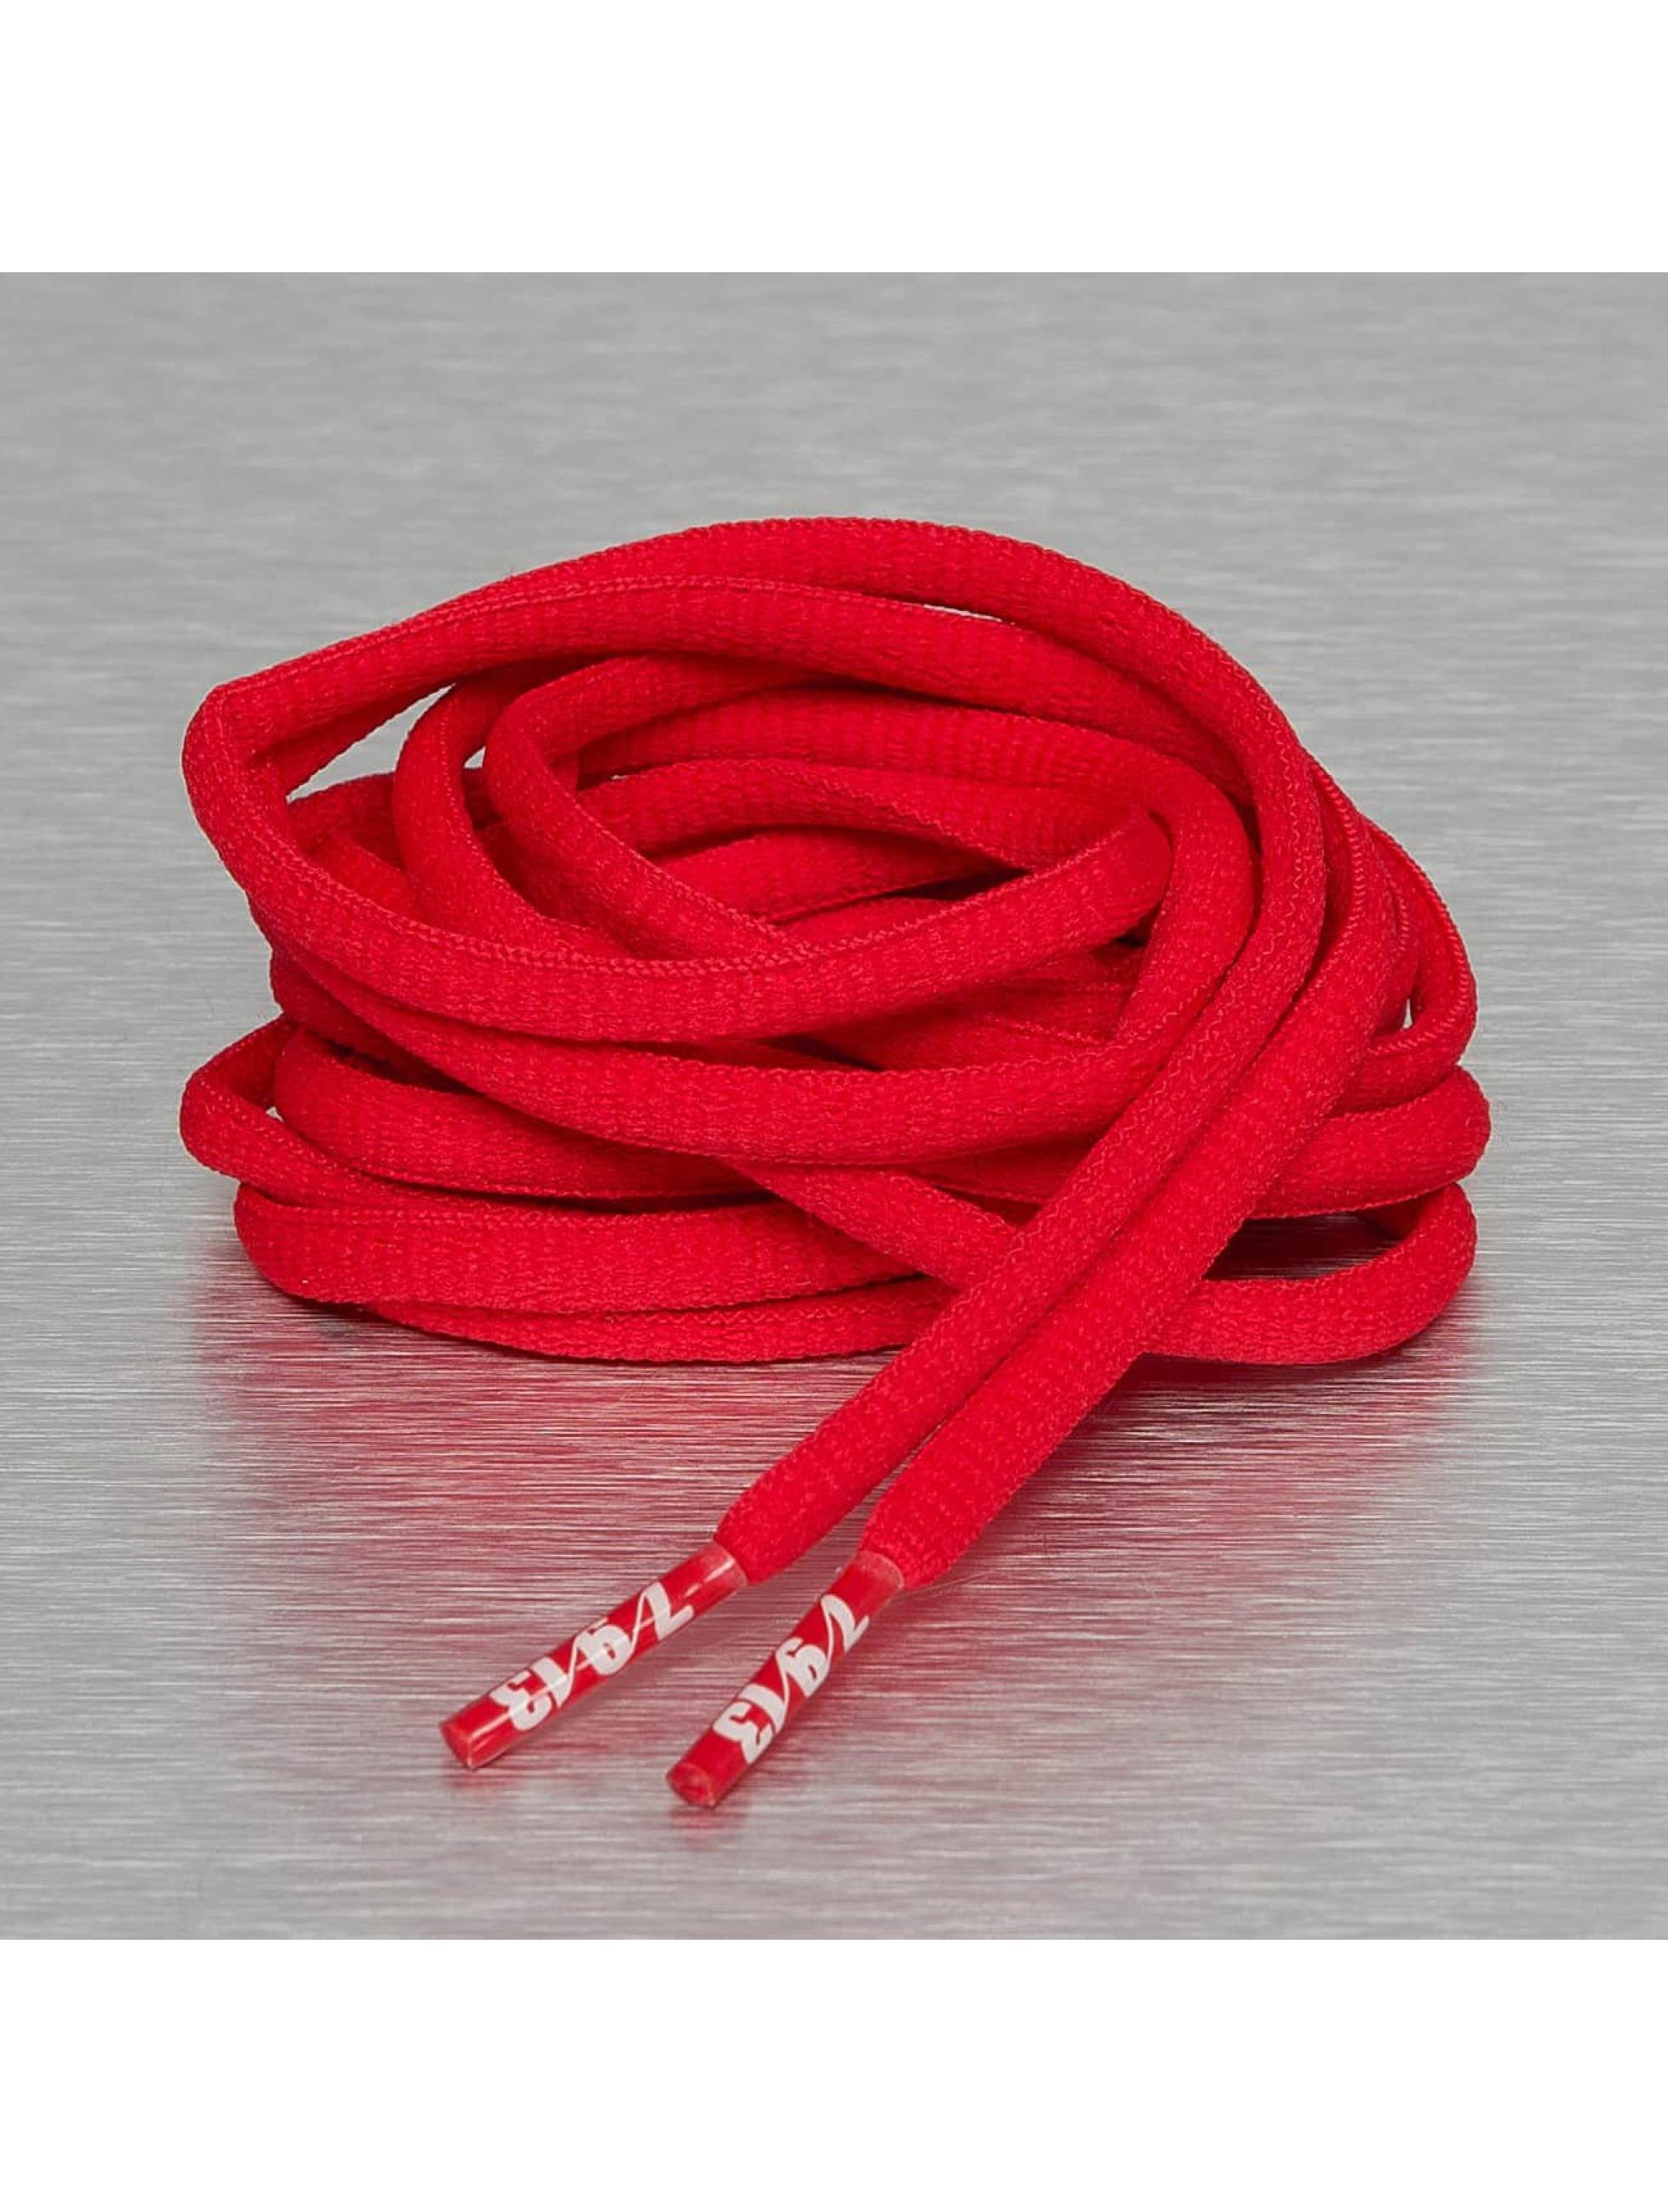 Seven Nine 13 шнурки Hard Candy Round красный